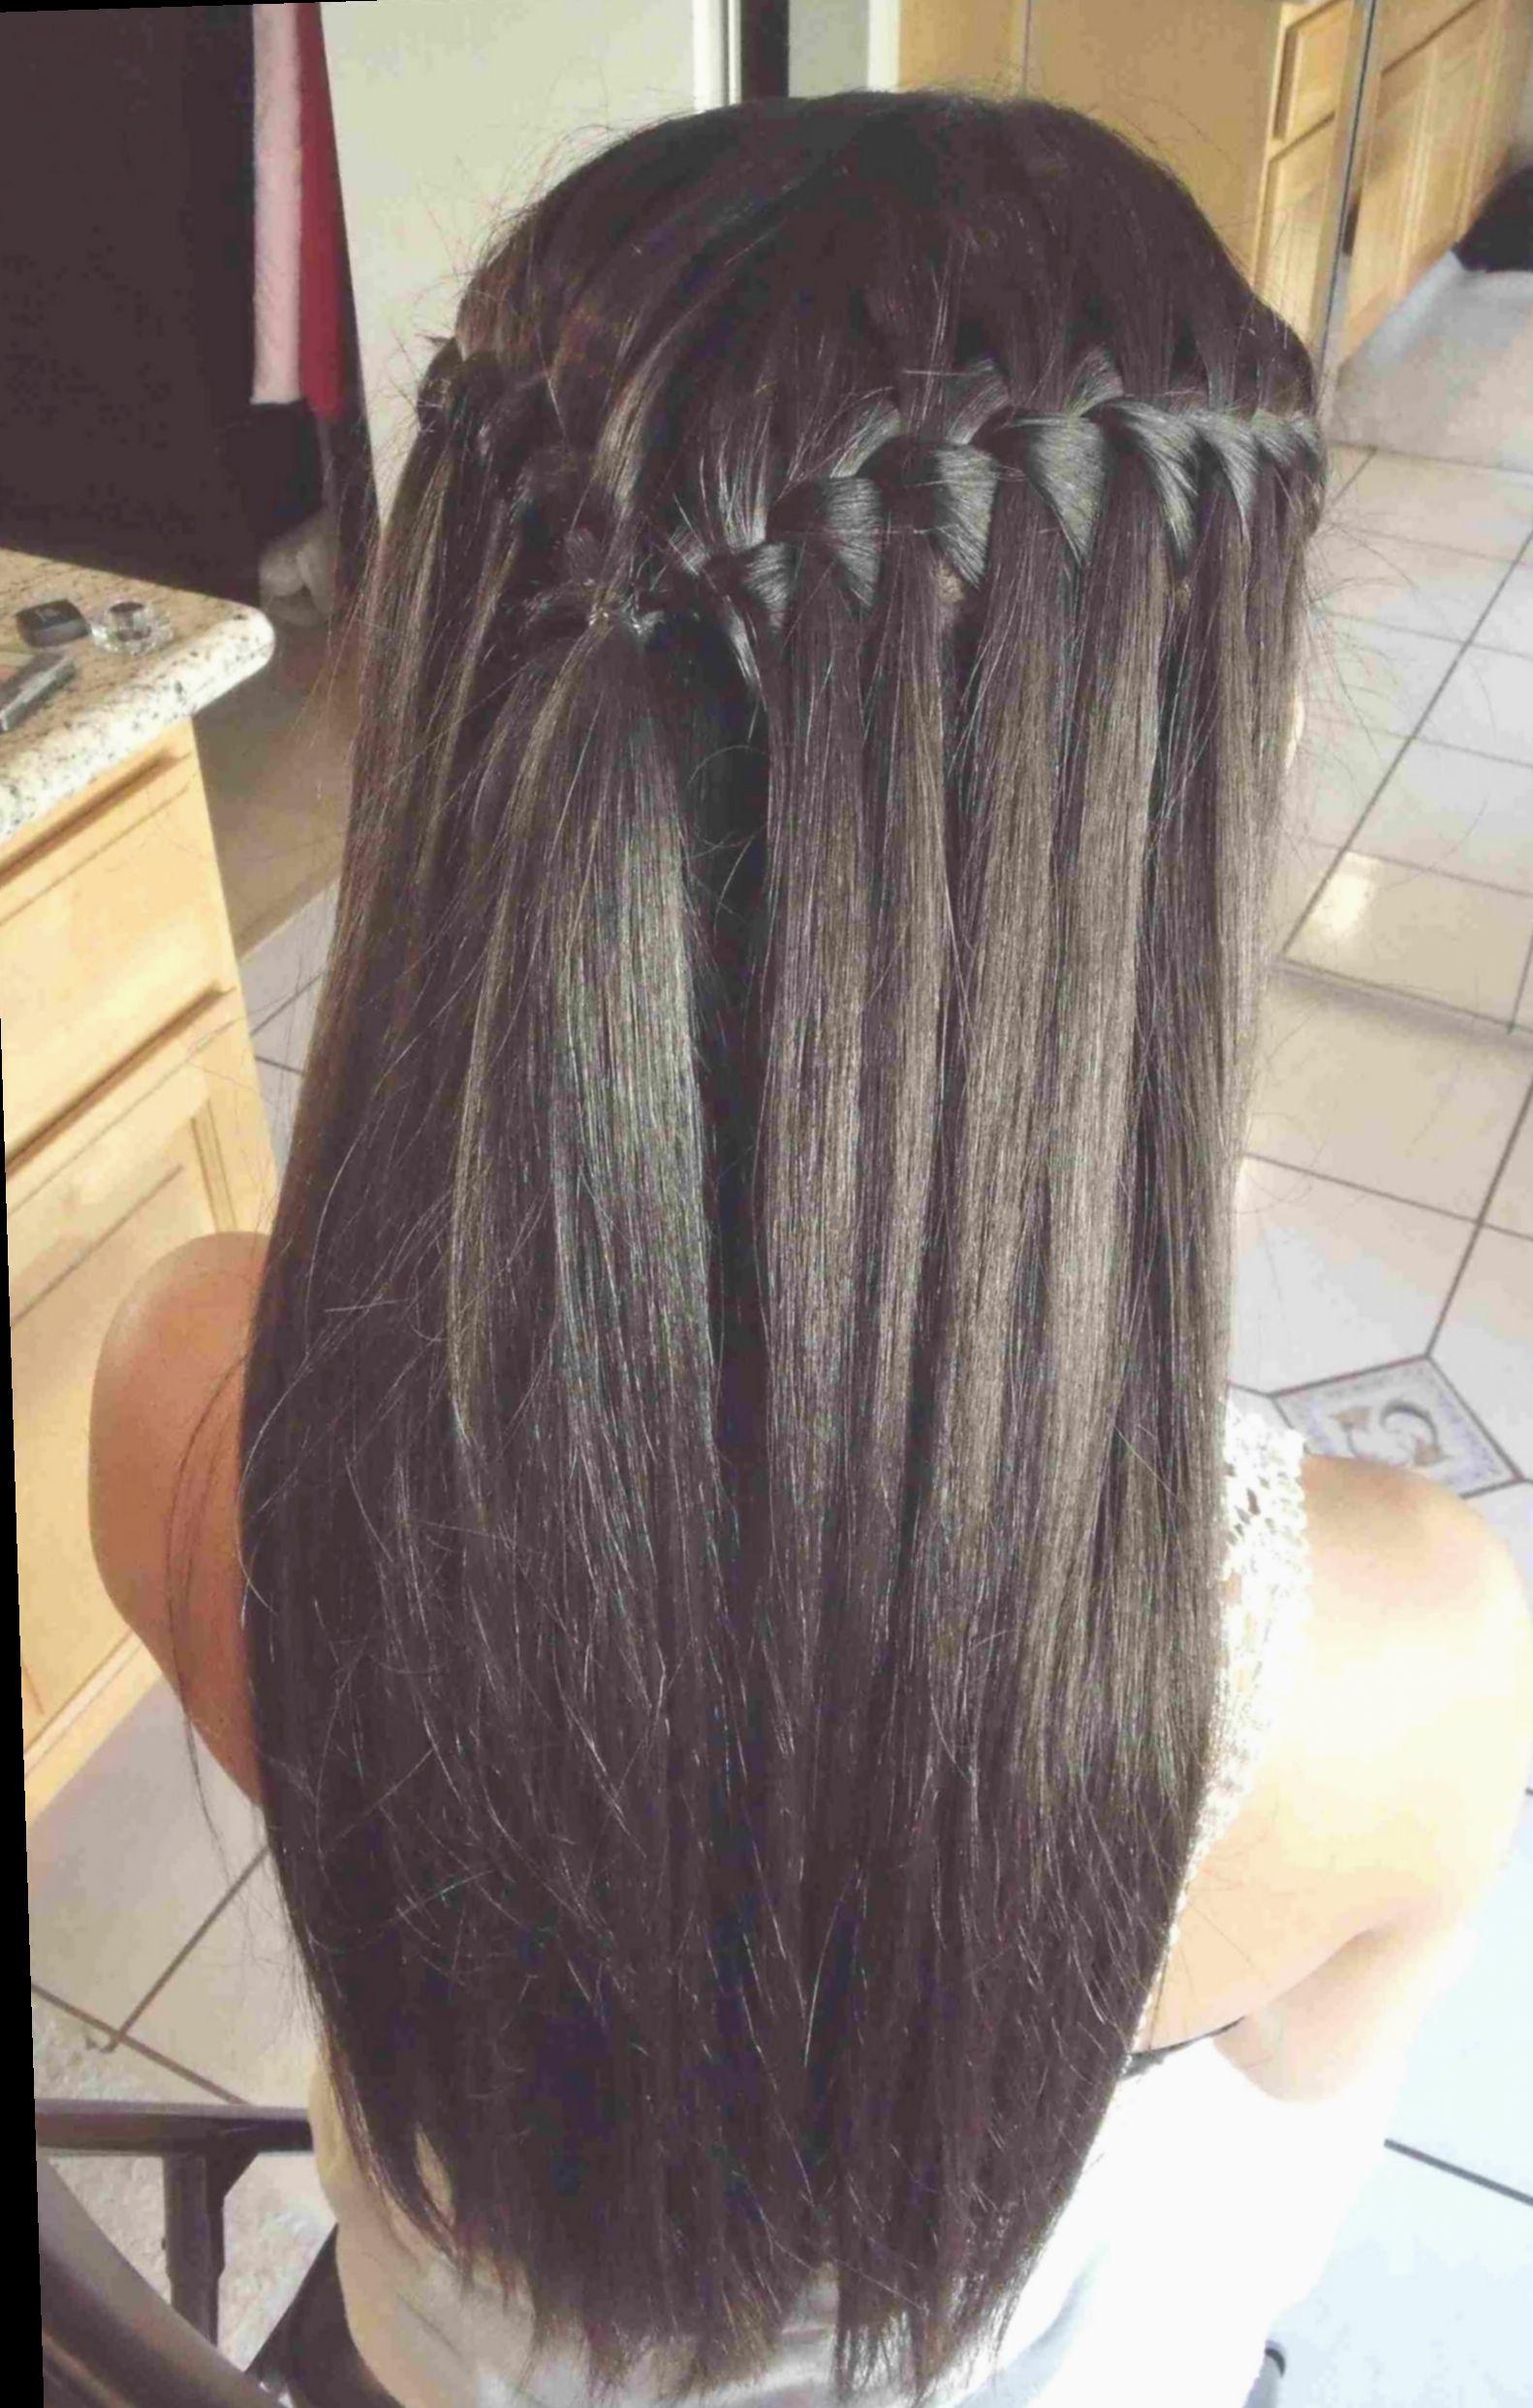 14 Hairstyles Prom Black Hair In 2020 Straight Hairstyles Braids For Black Hair Hair Styles